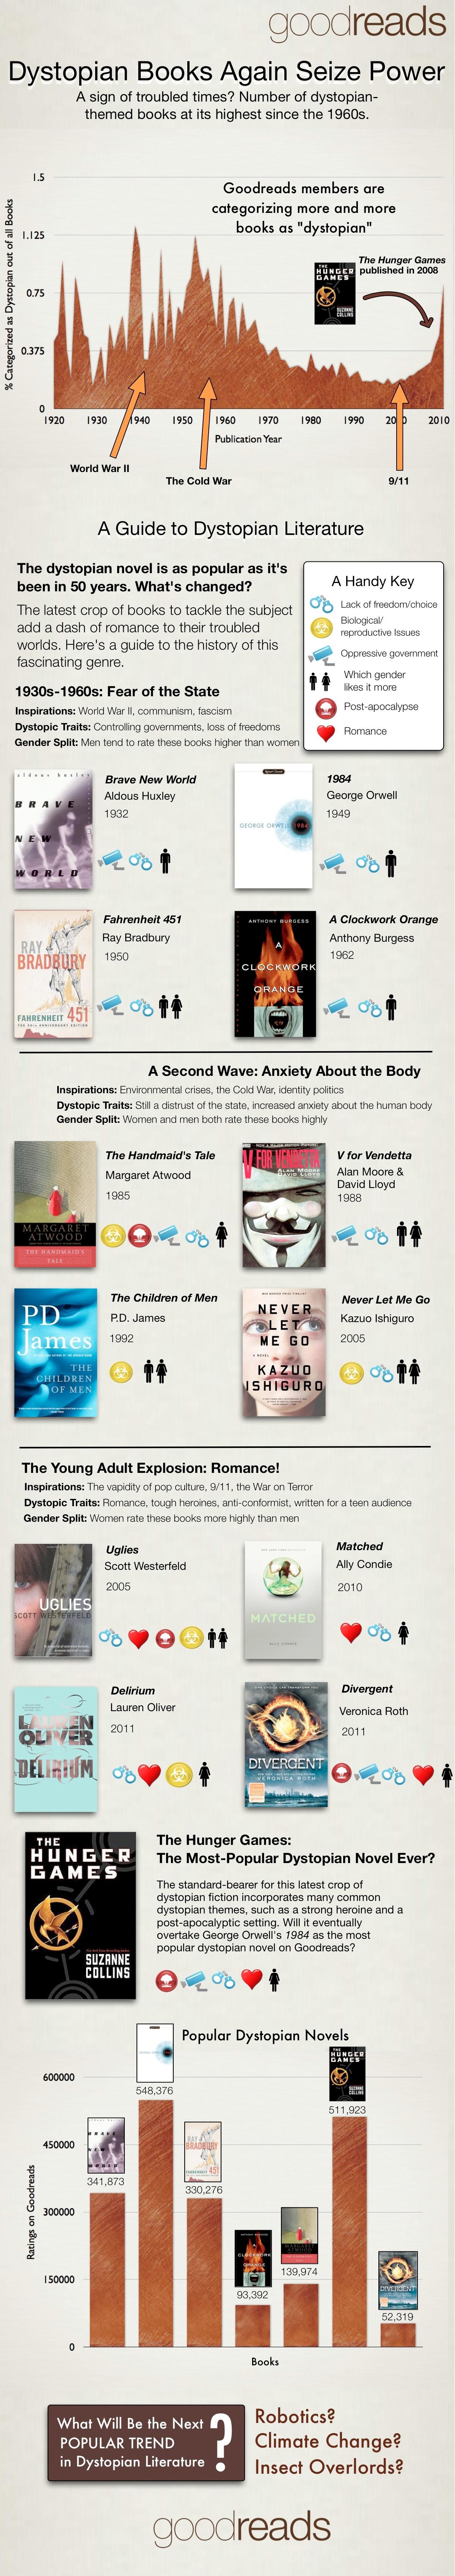 Dystopian books seize power infographic